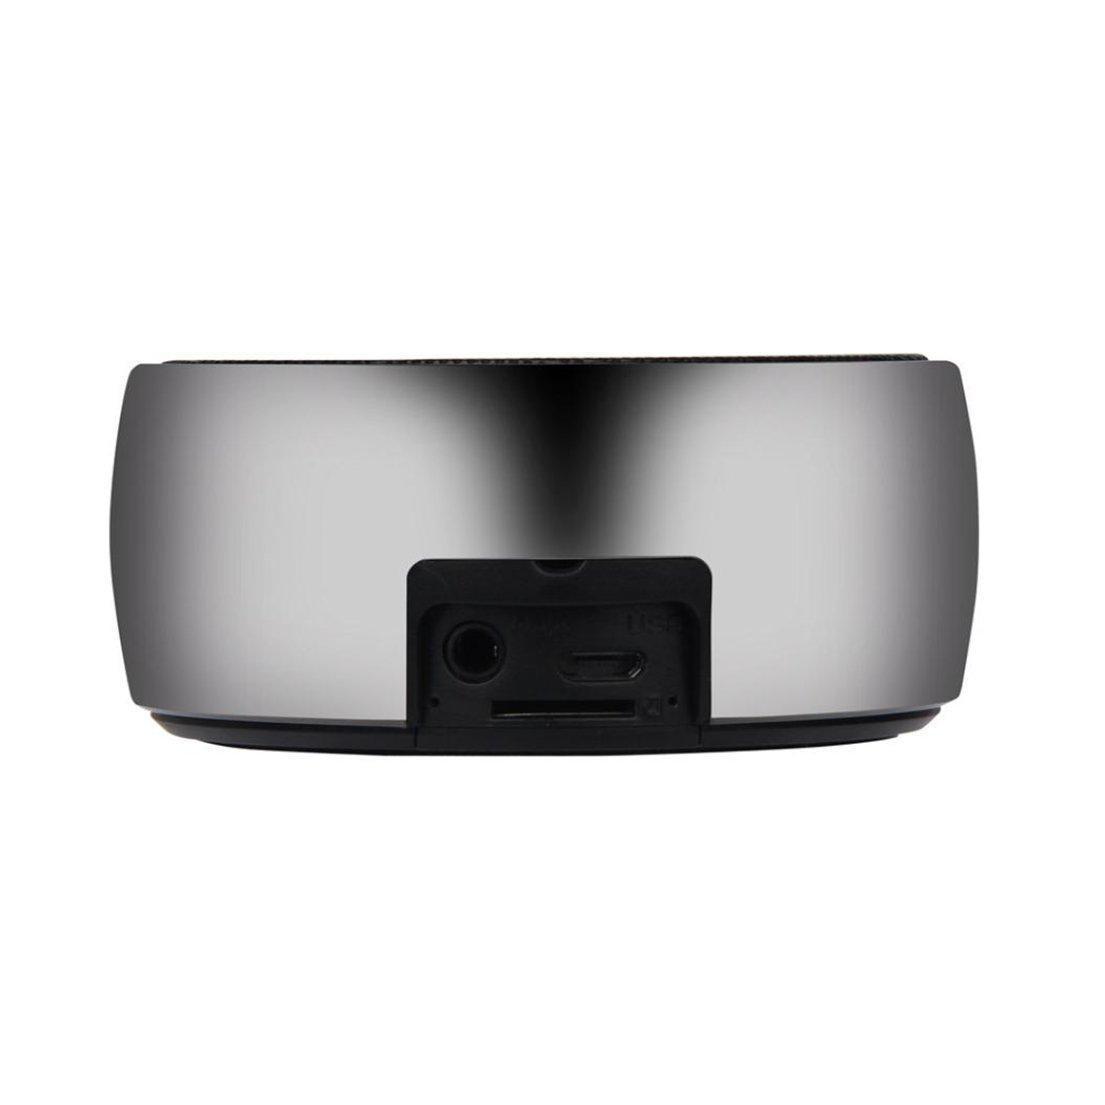 Alonea Portable Mini Speaker Super Bass Hifi Stereo Wireless Bluetooth Subwoofer (Black)